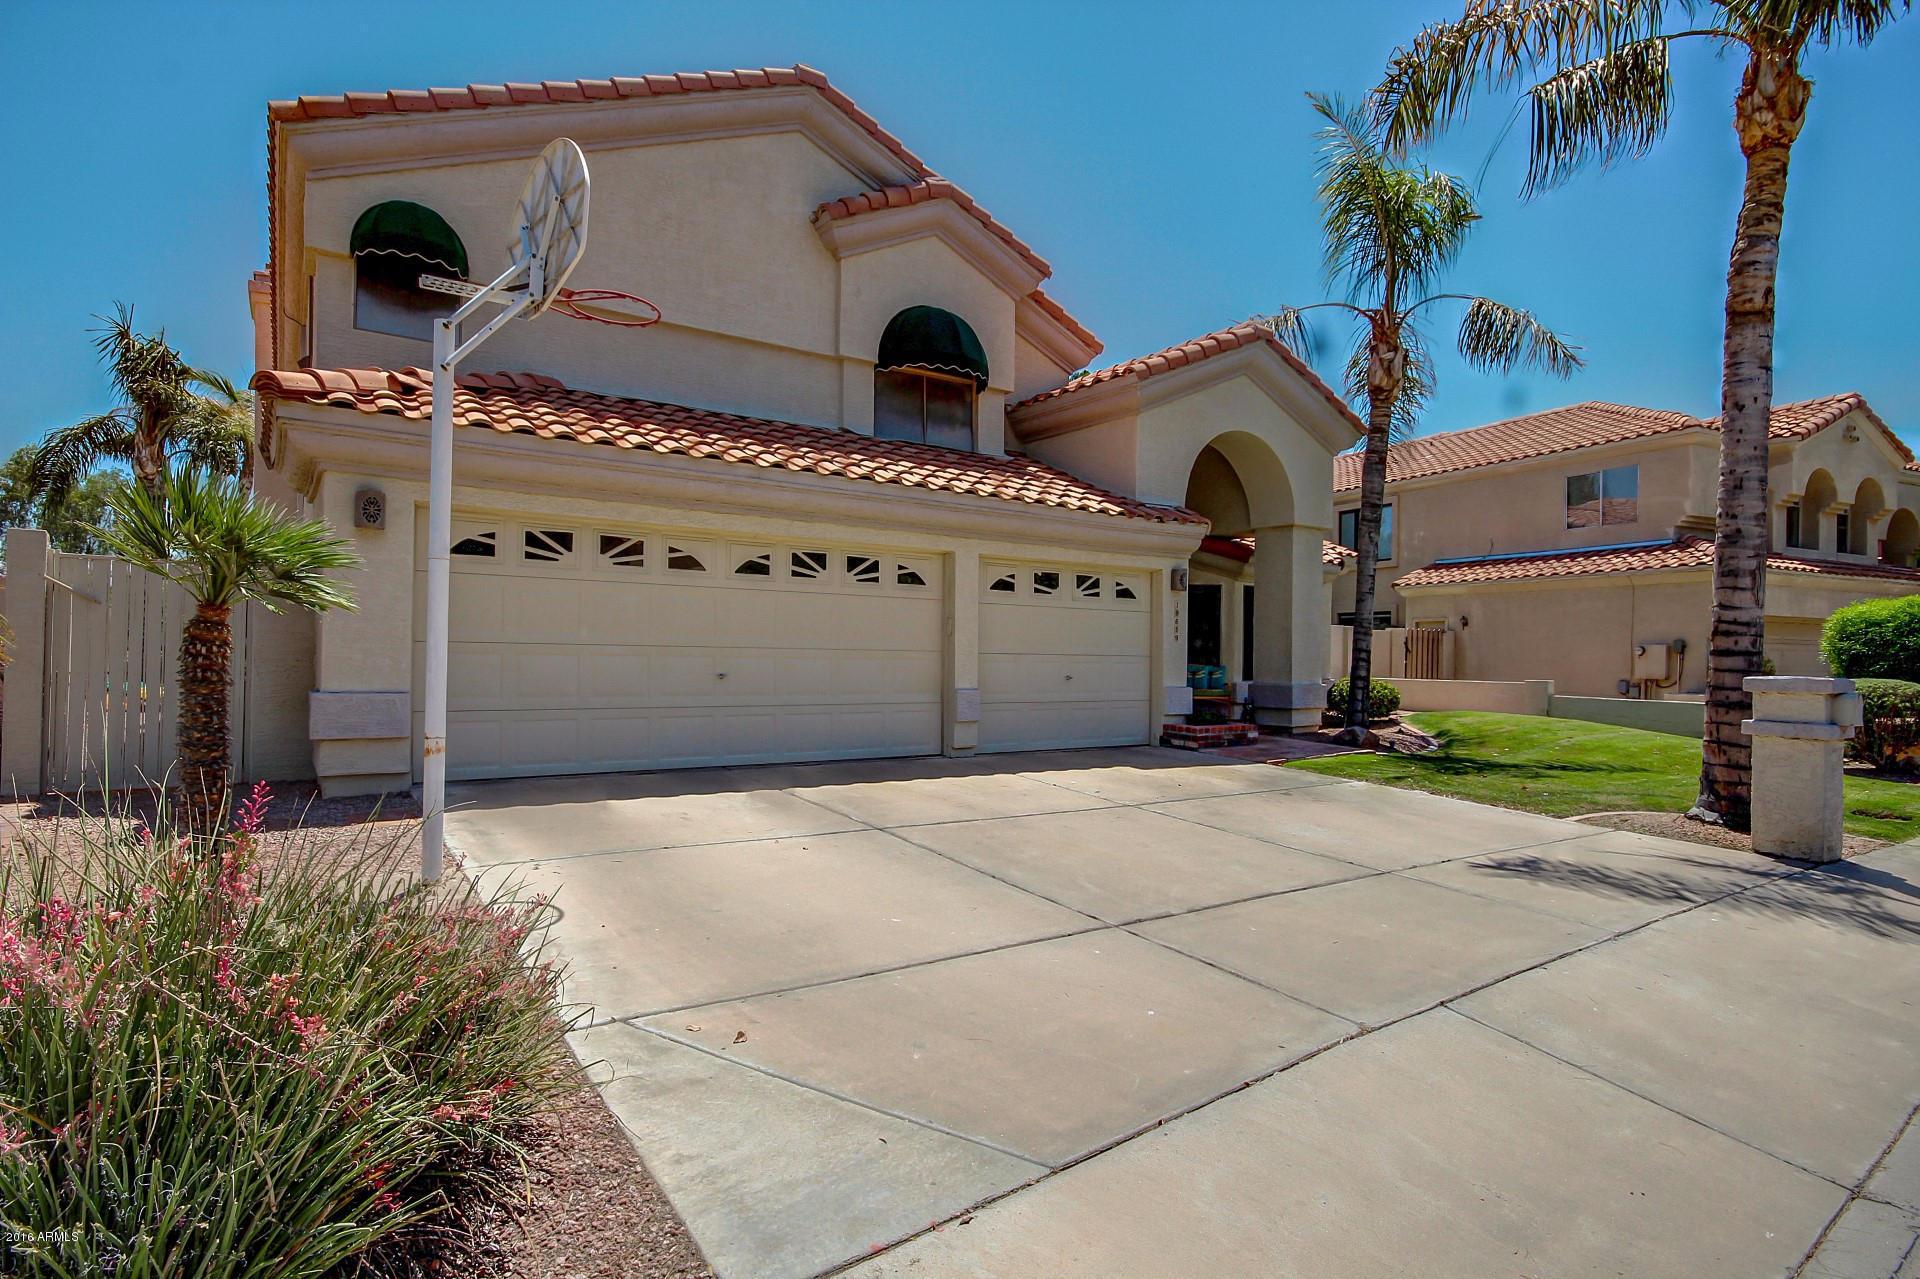 Photo of 19619 N 69TH Avenue, Glendale, AZ 85308